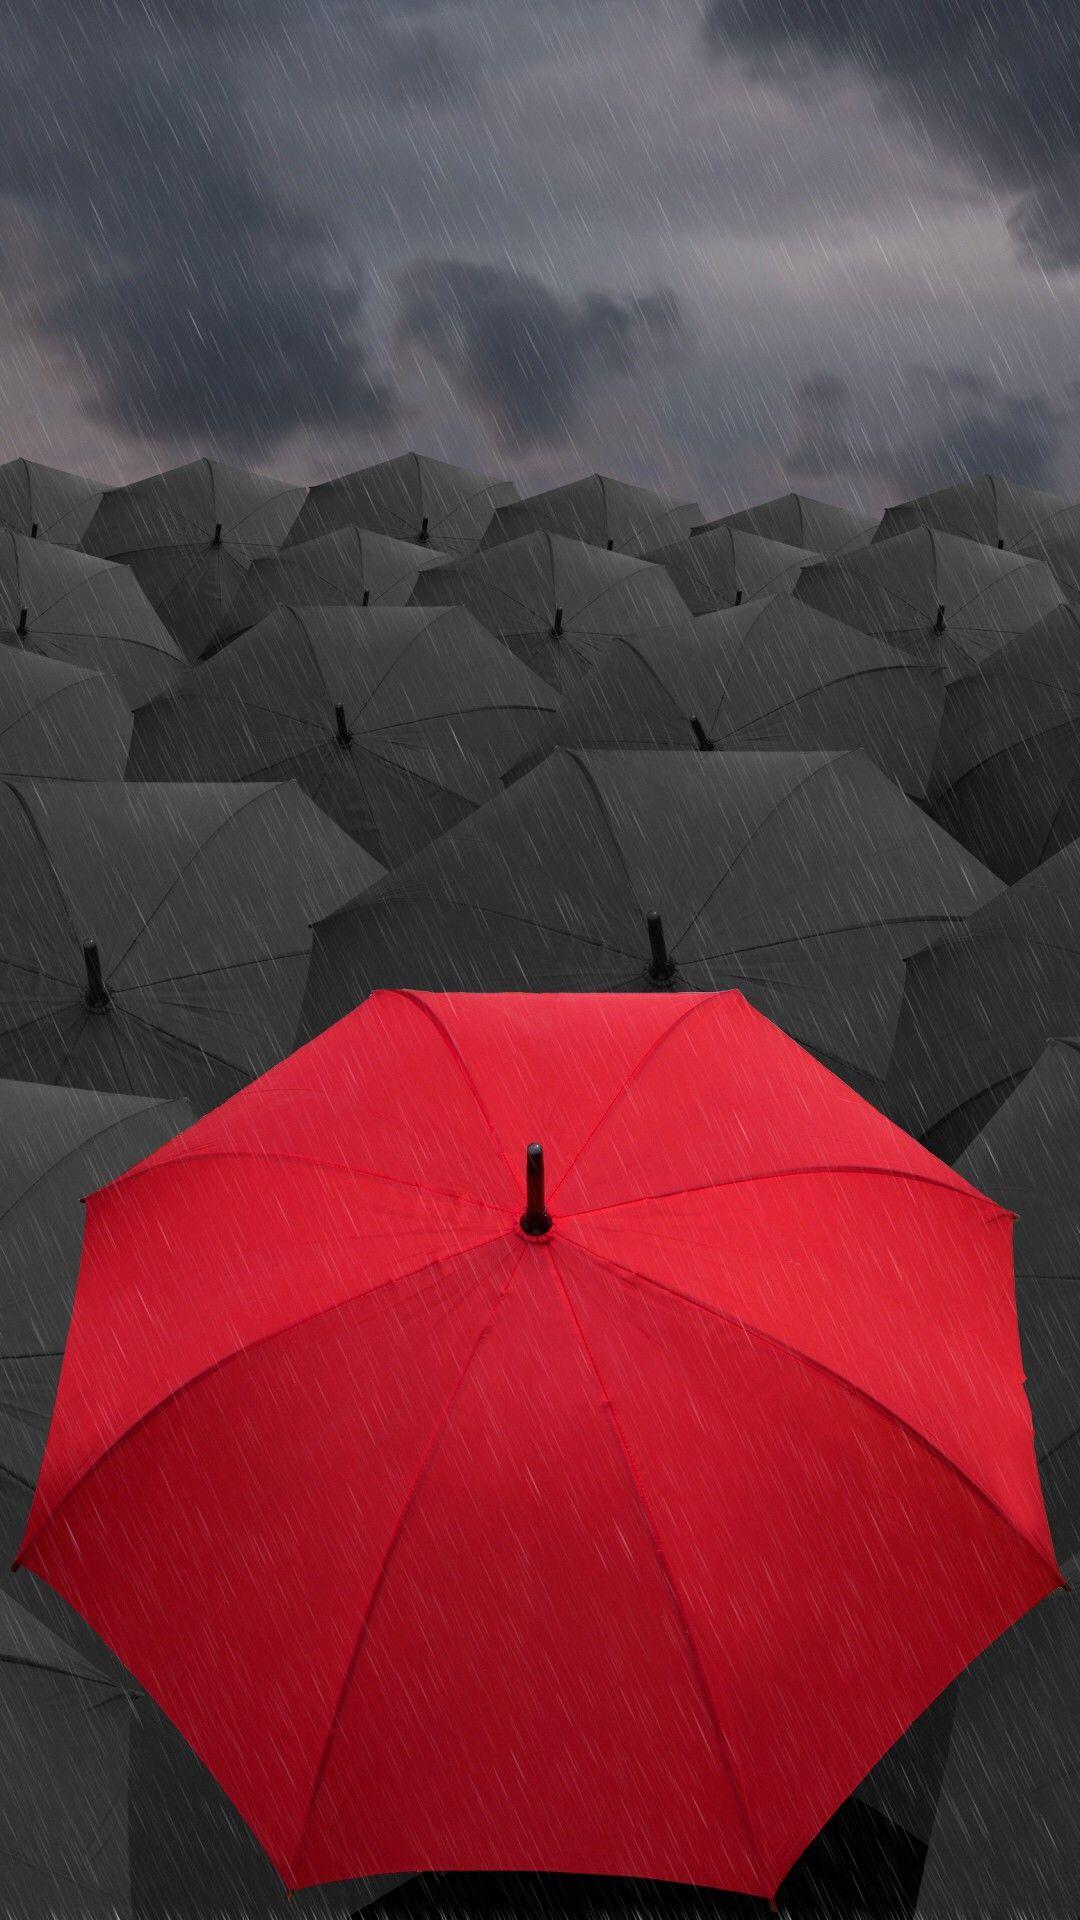 Rain Umbrella Hd Wallpaper Iphone Best Iphone Wallpaper Red Umbrella Hd Wallpaper Iphone Photography Wallpaper